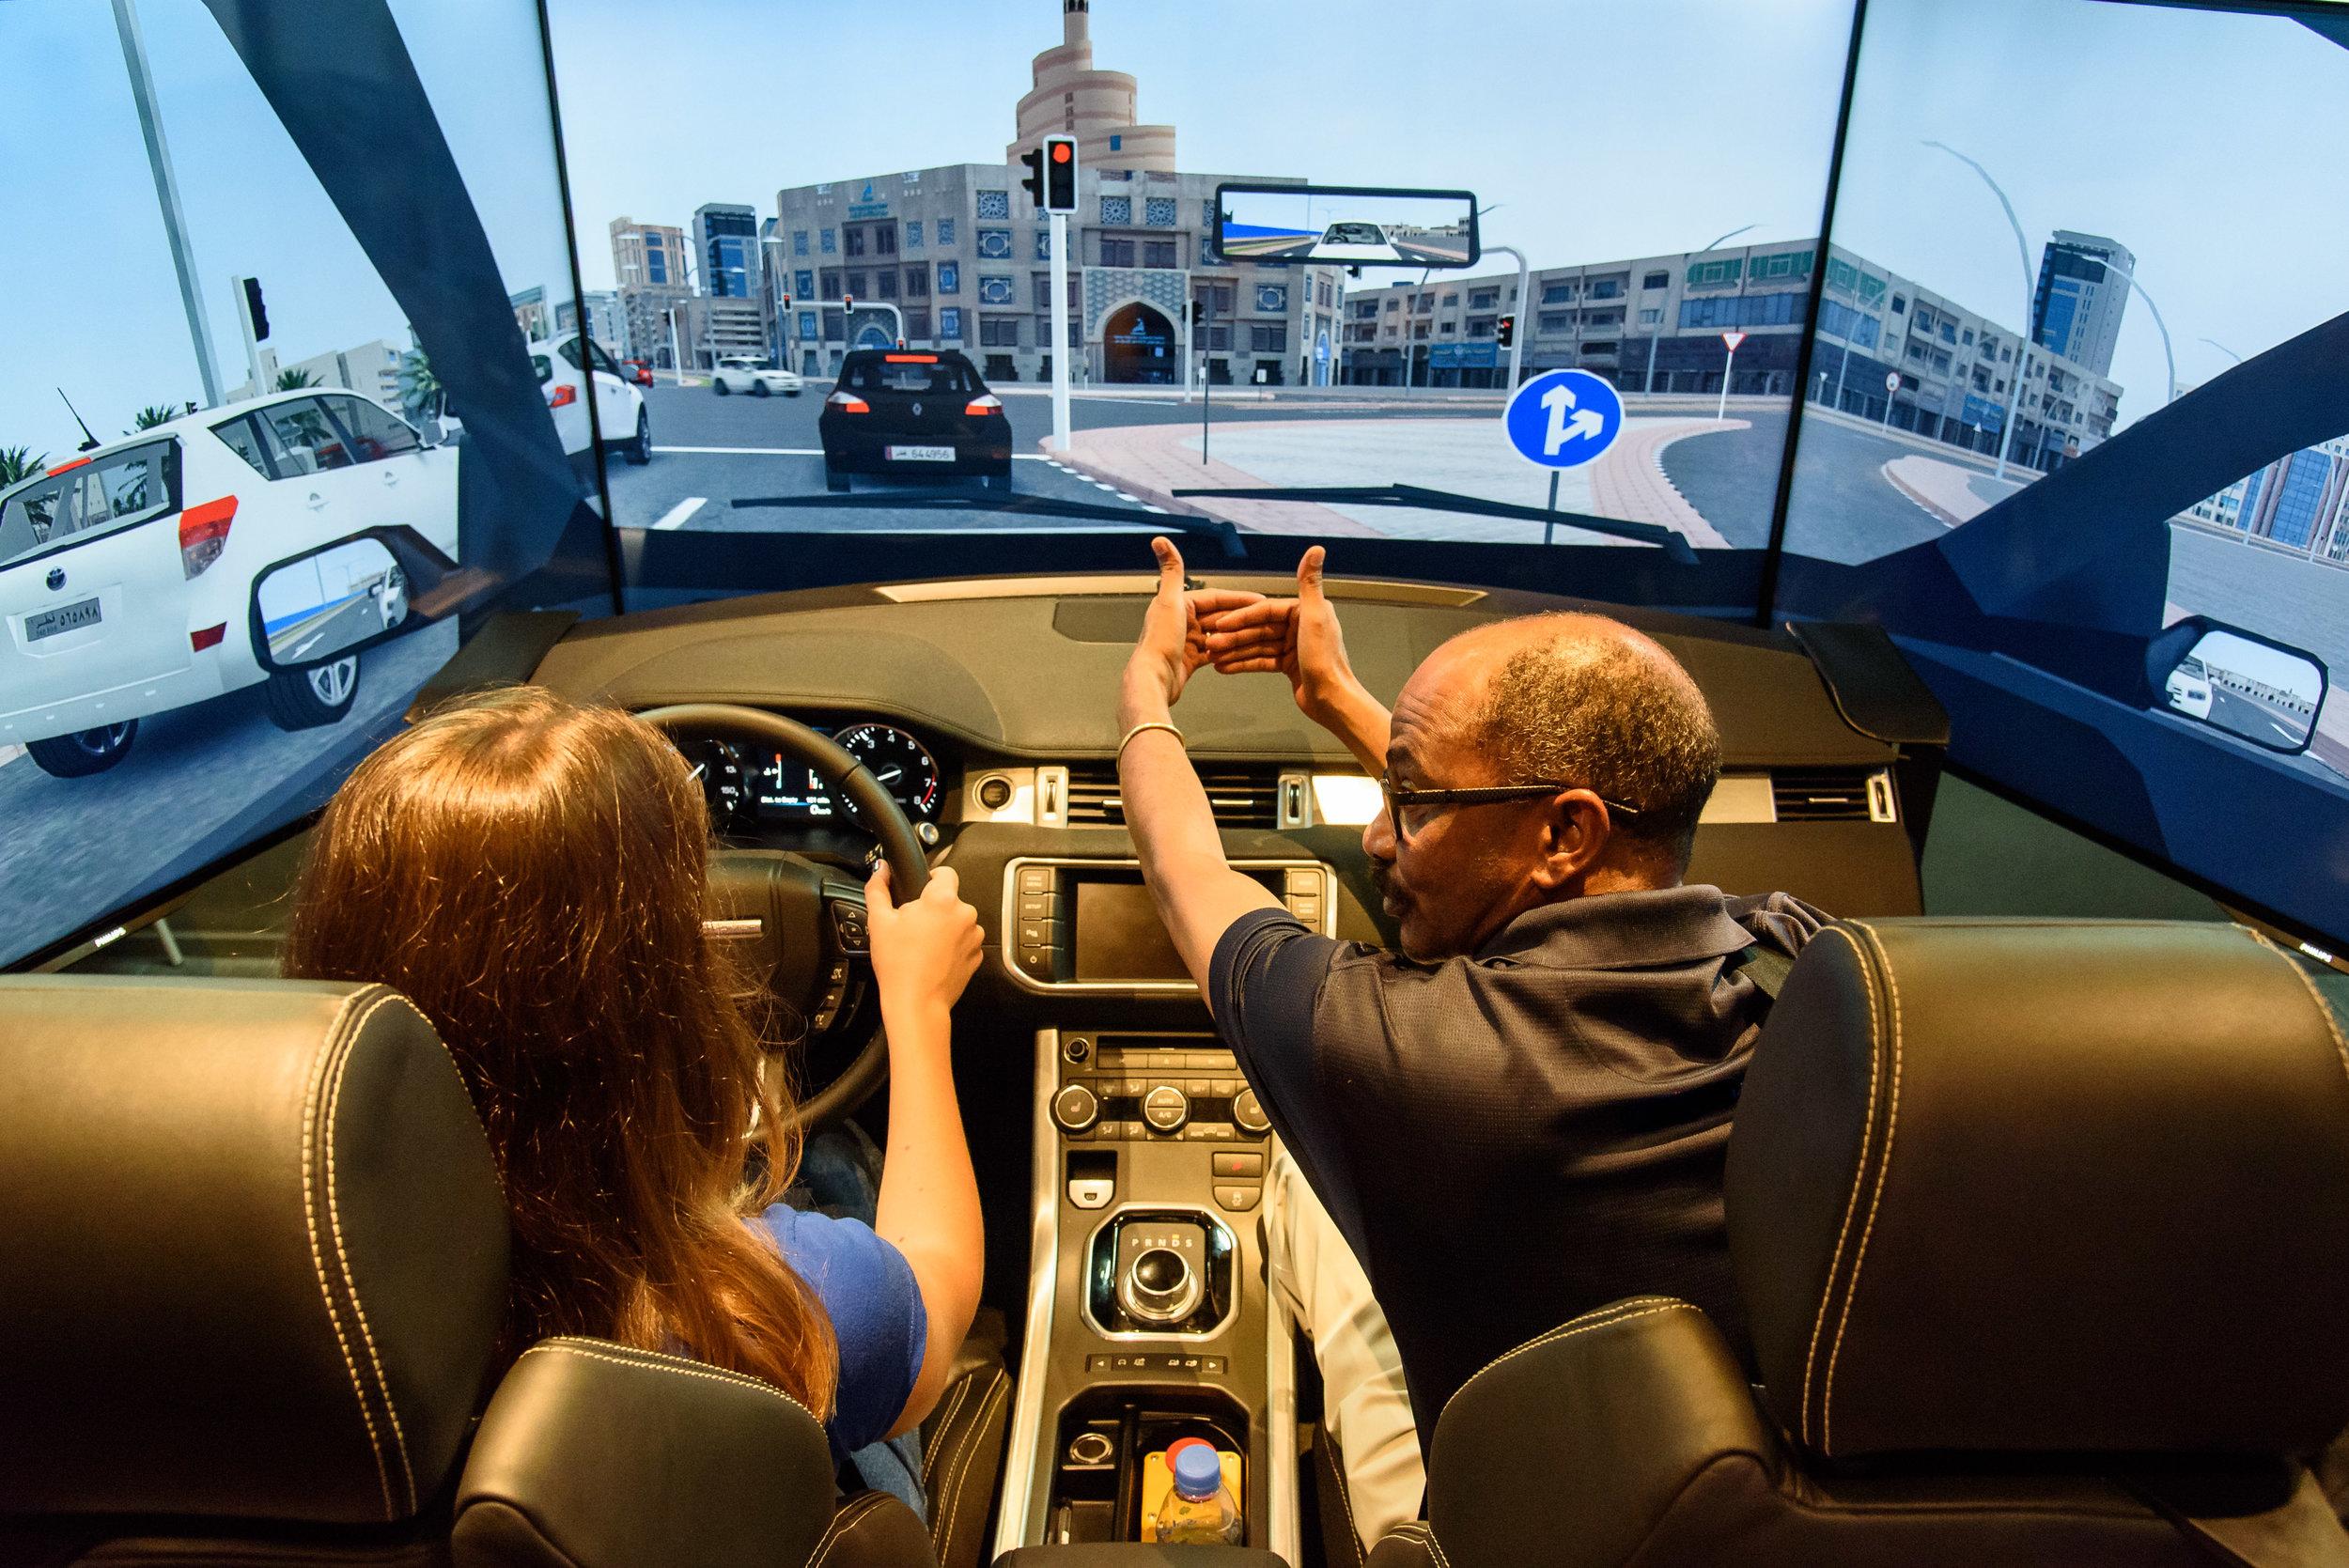 Gamyra Tech Driver Simulation Training